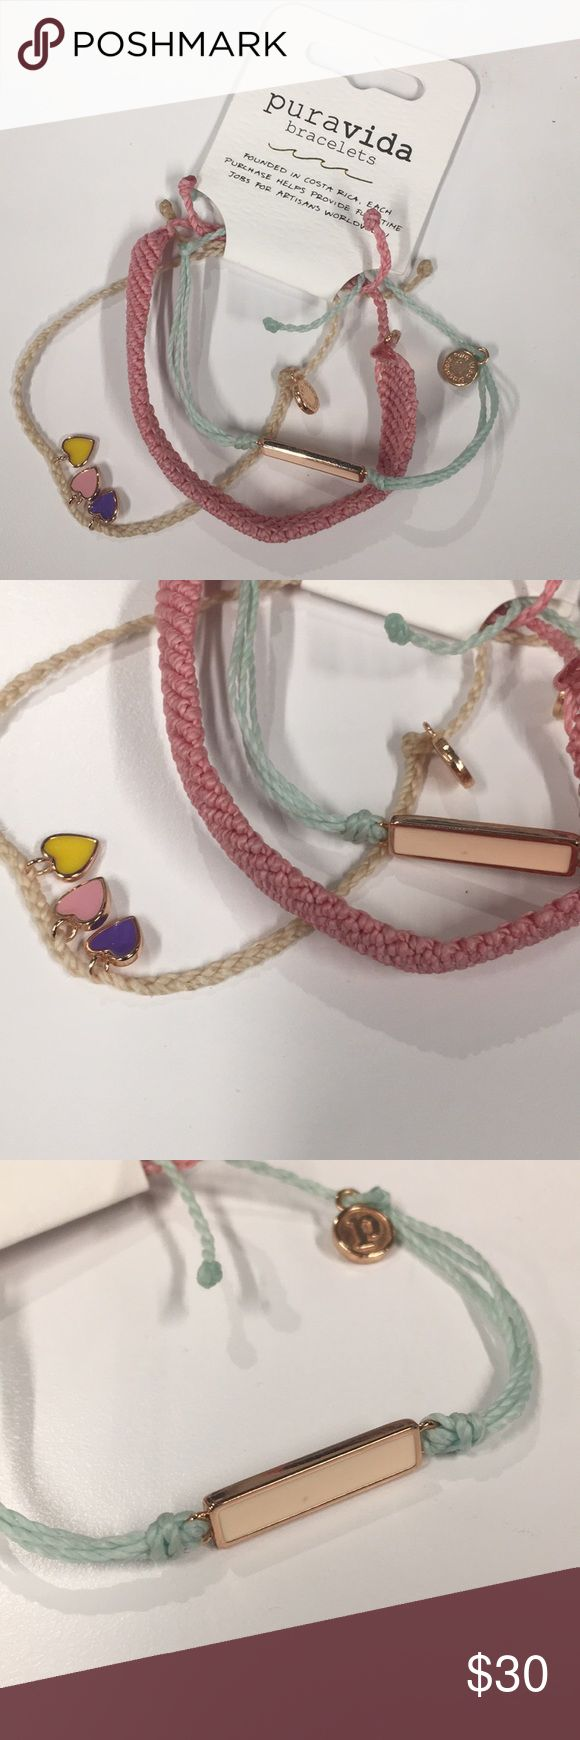 Pura Vida Bracelets Style Pack Three Bracelets Style Pack!  Creme colored string… – My Posh Picks